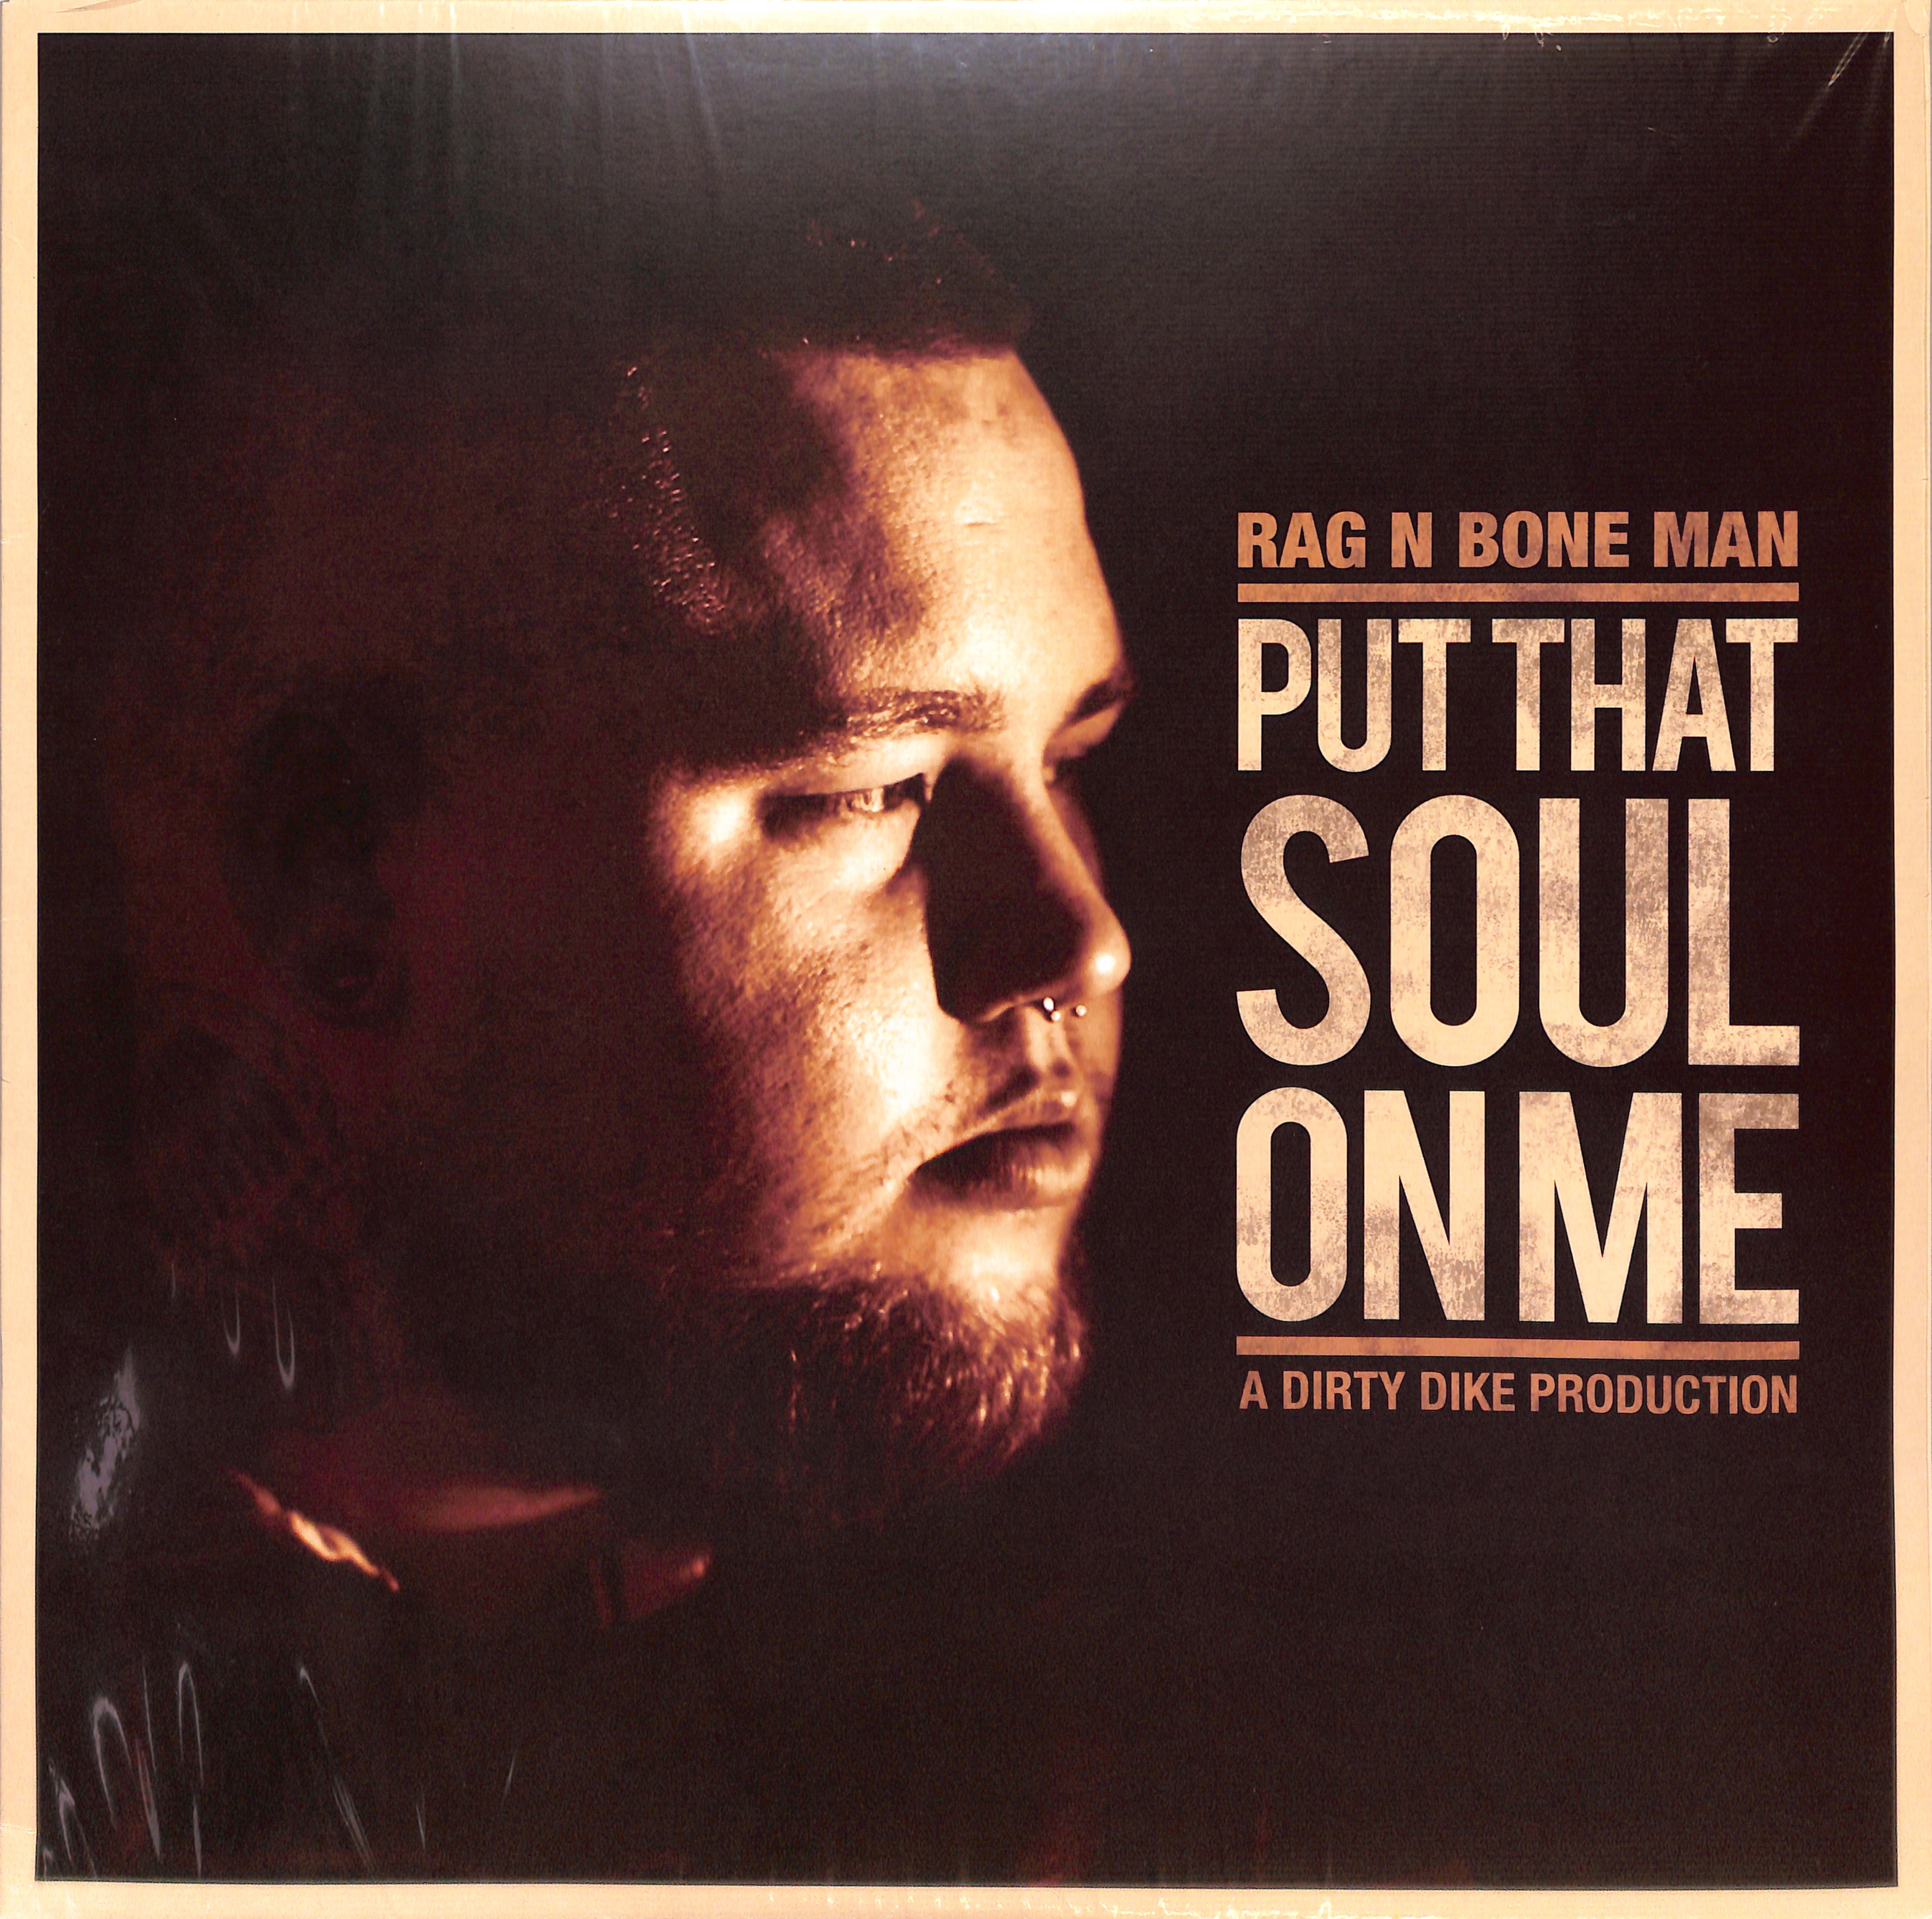 Rag N Bone Man - PUT THAT SOUL ON ME